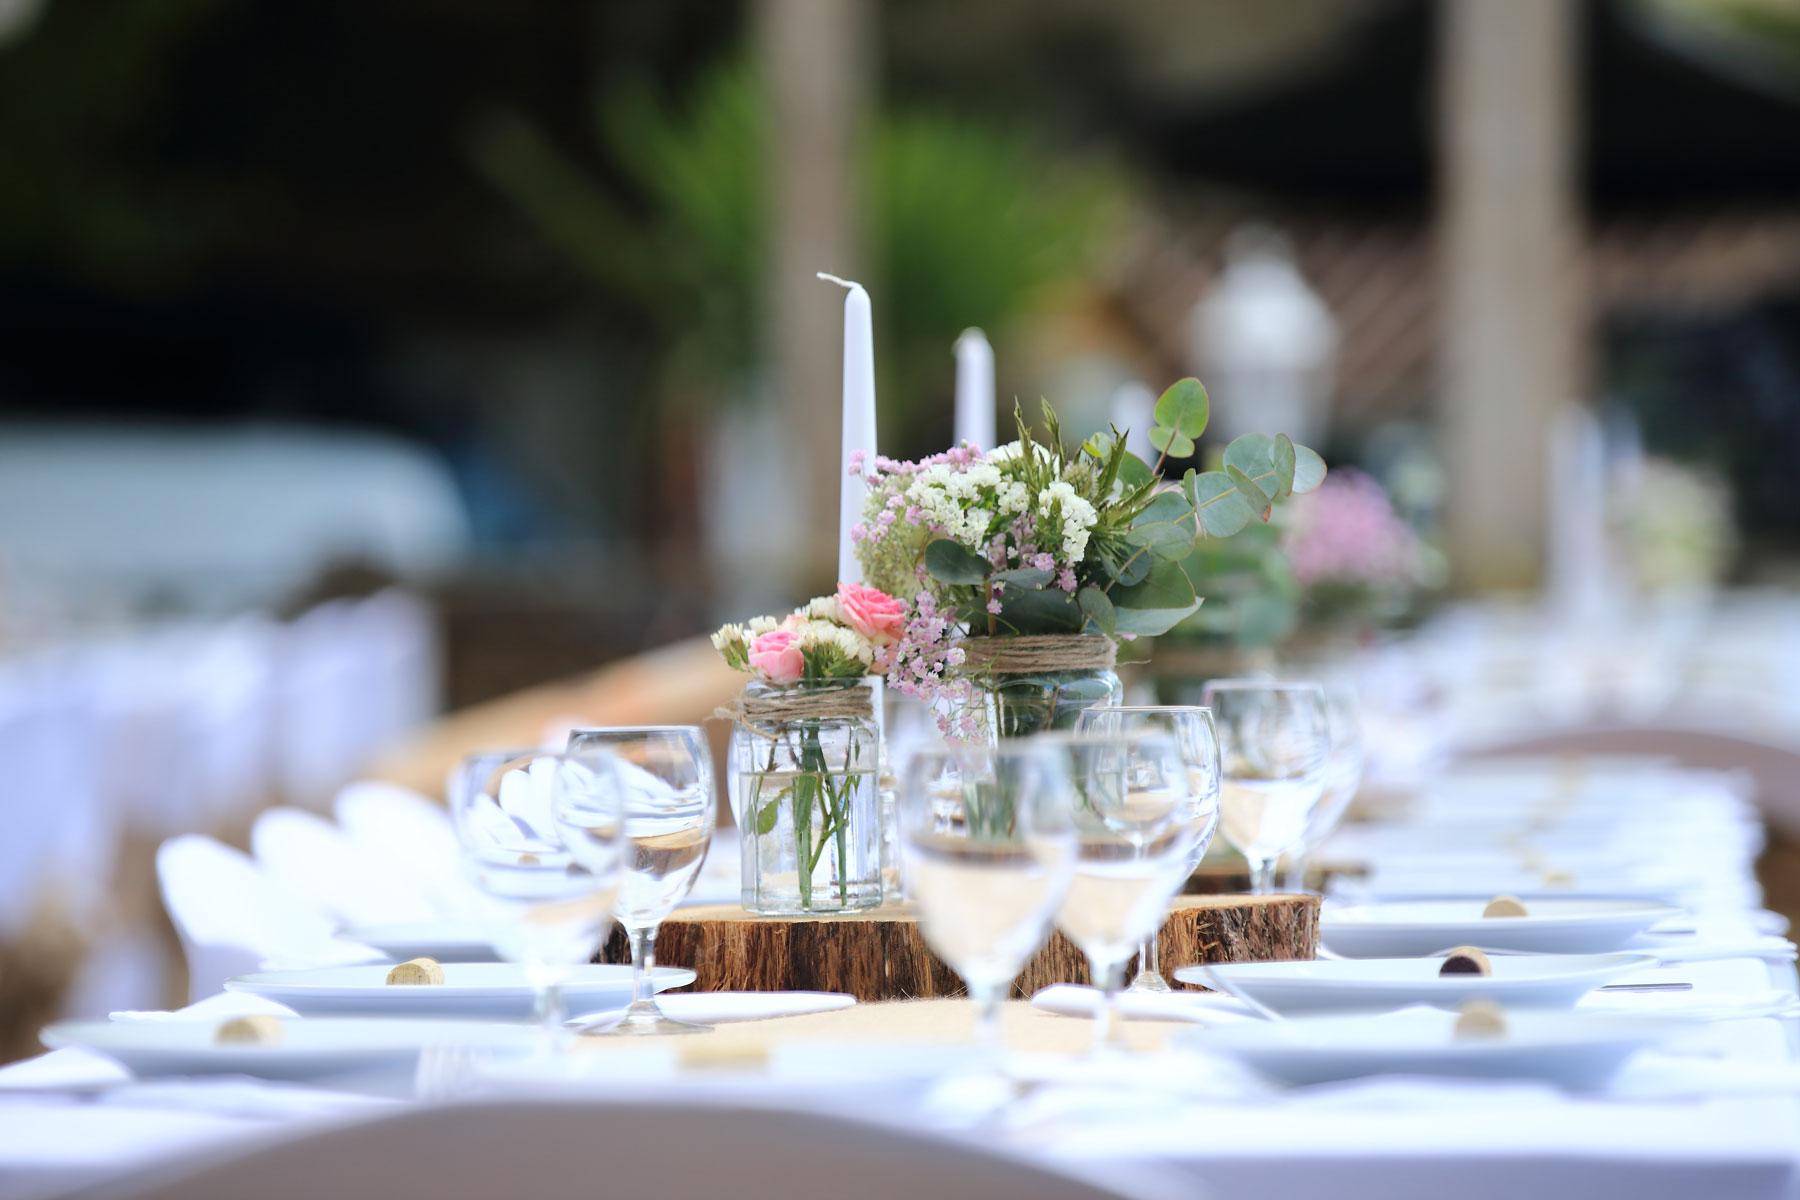 Decoration-table-mariage-sur-la-plage-studio-aloki-3